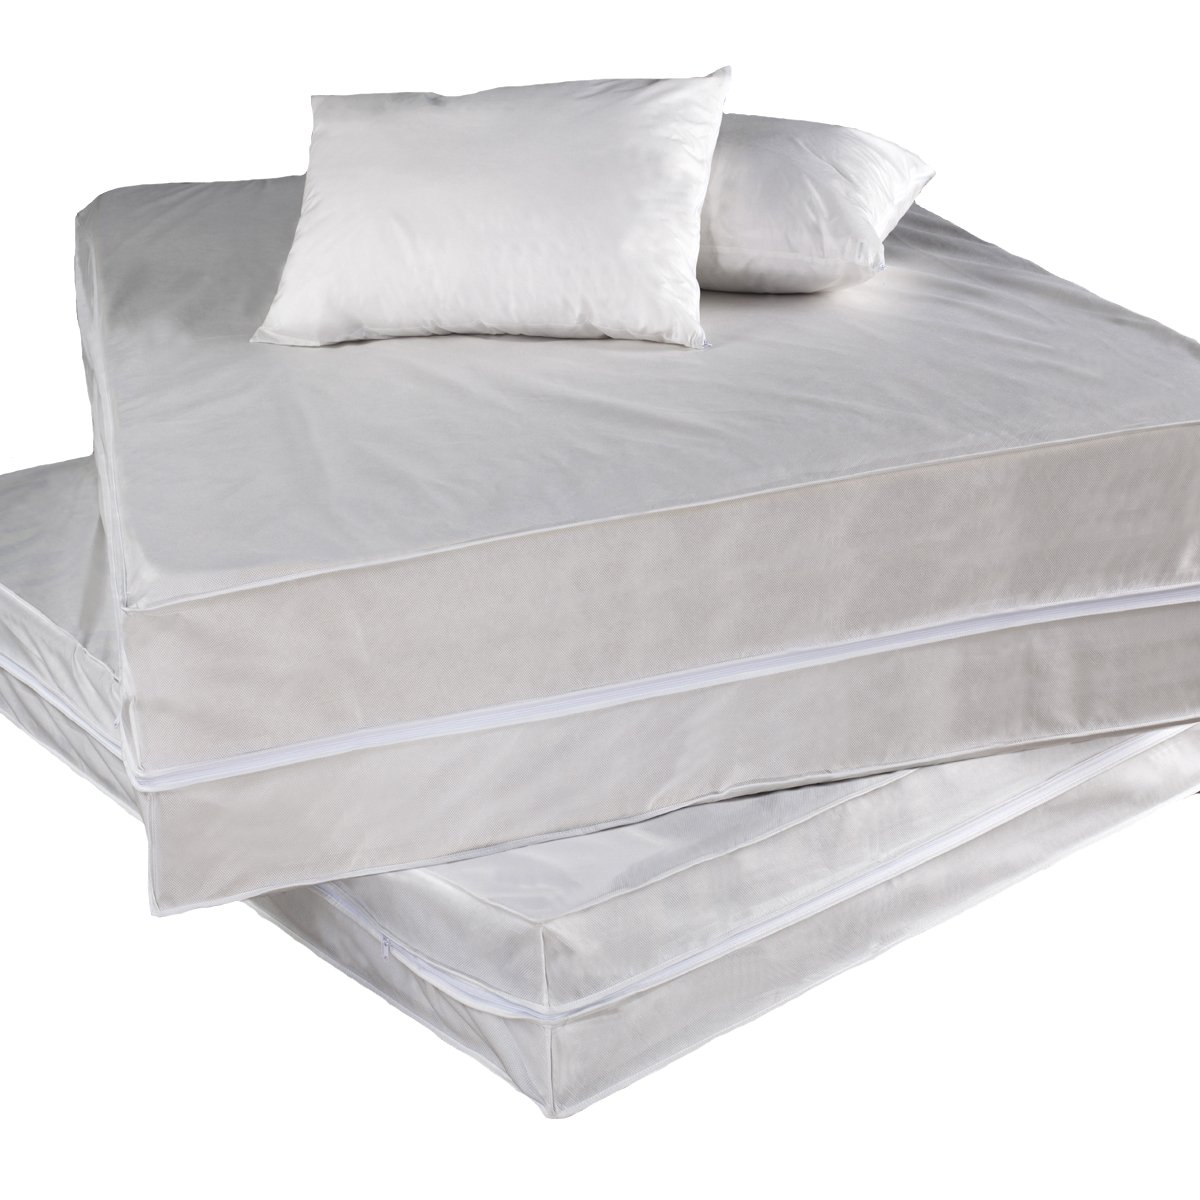 amazoncom permafresh 4piece complete bed protector set queen home u0026 kitchen - Bed Bug Protector